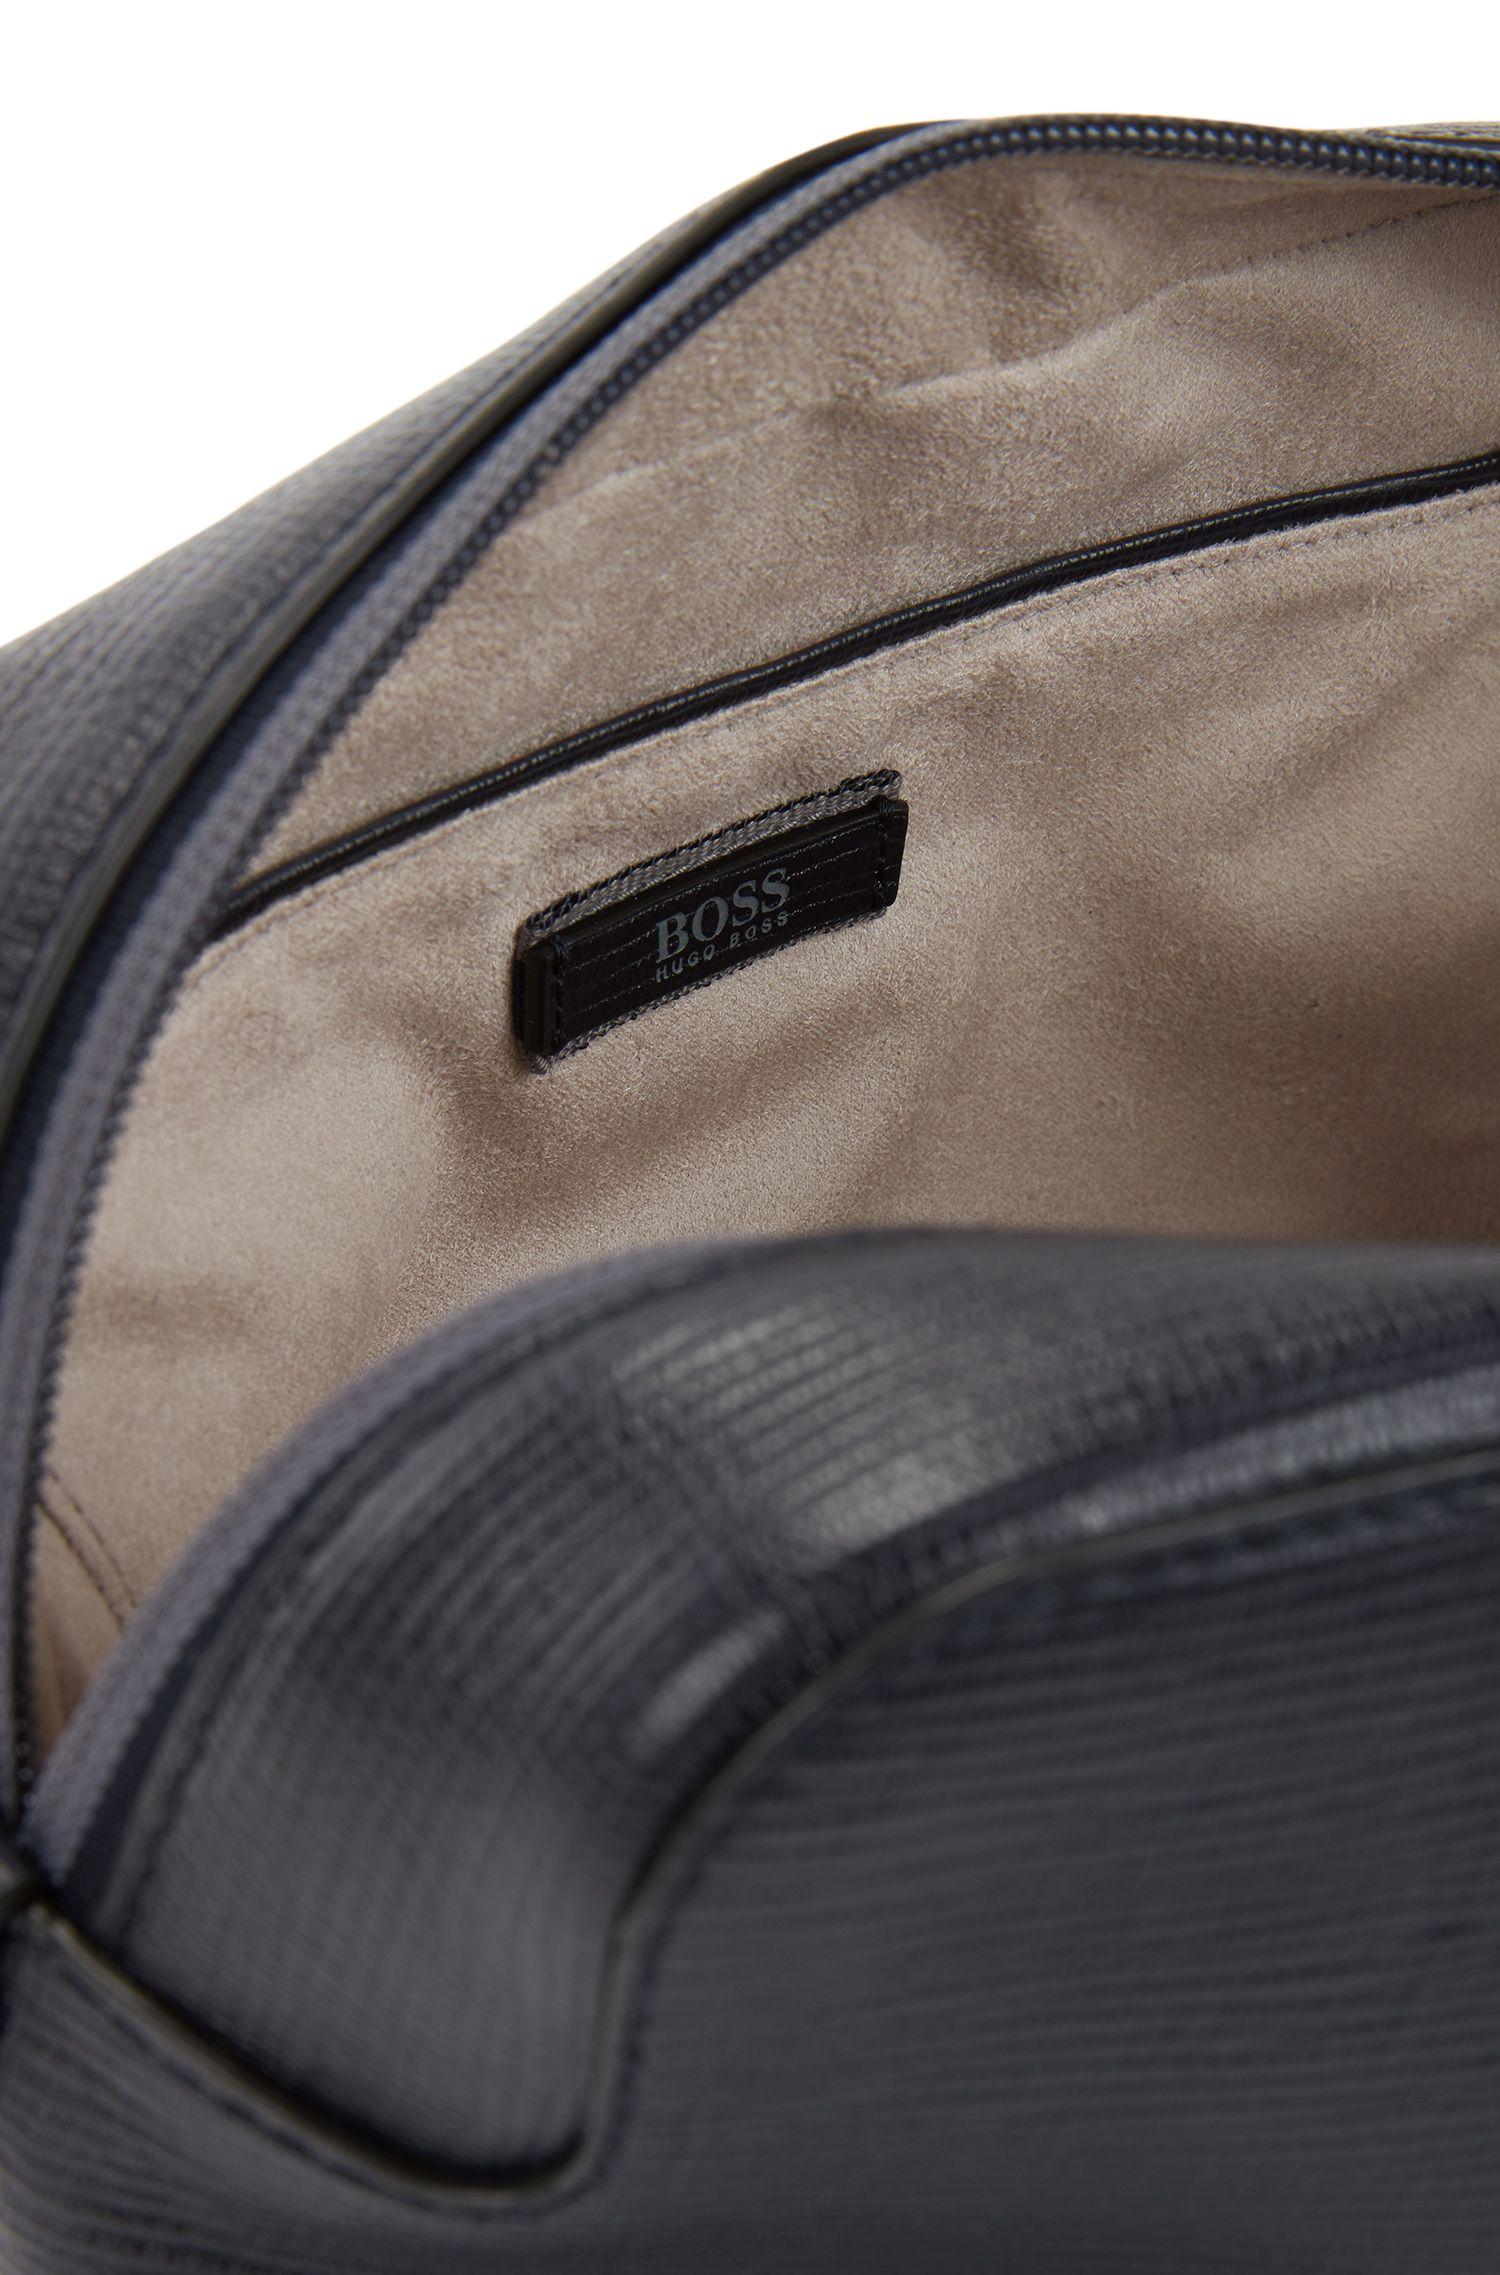 Wash bag in printed Italian leather